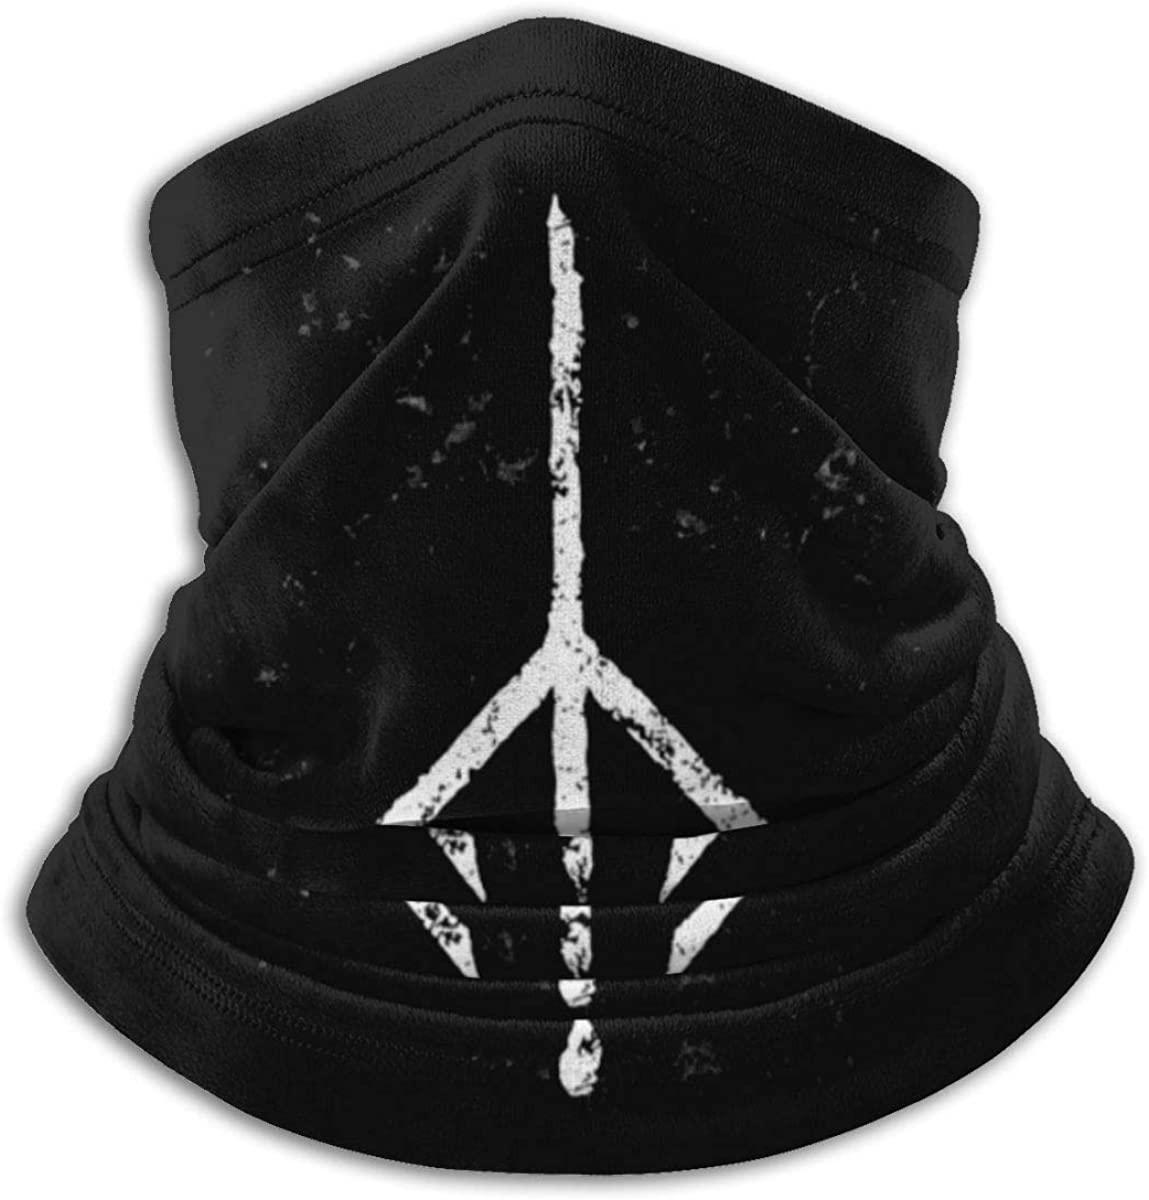 Fullmetal Alchemist Unisex Fashion Face Bandanas Head Band Wears Scarf Face Tube Neck Scarf